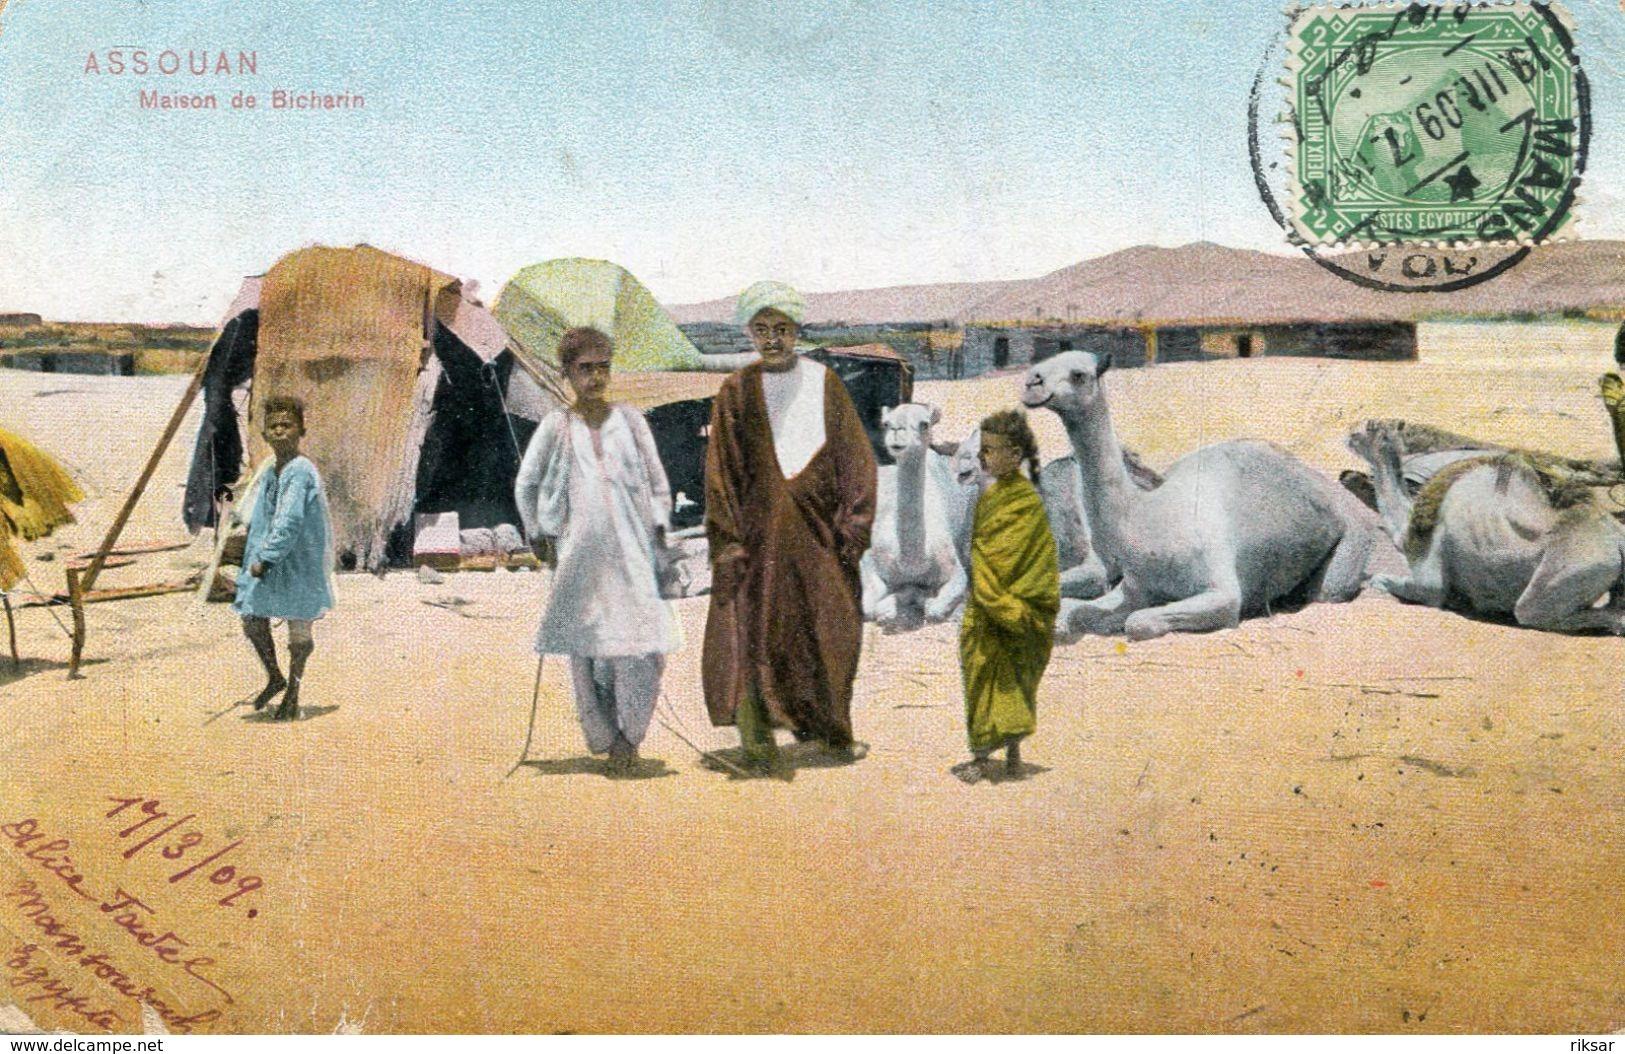 EGYPTE(ASSUAN) - Aswan